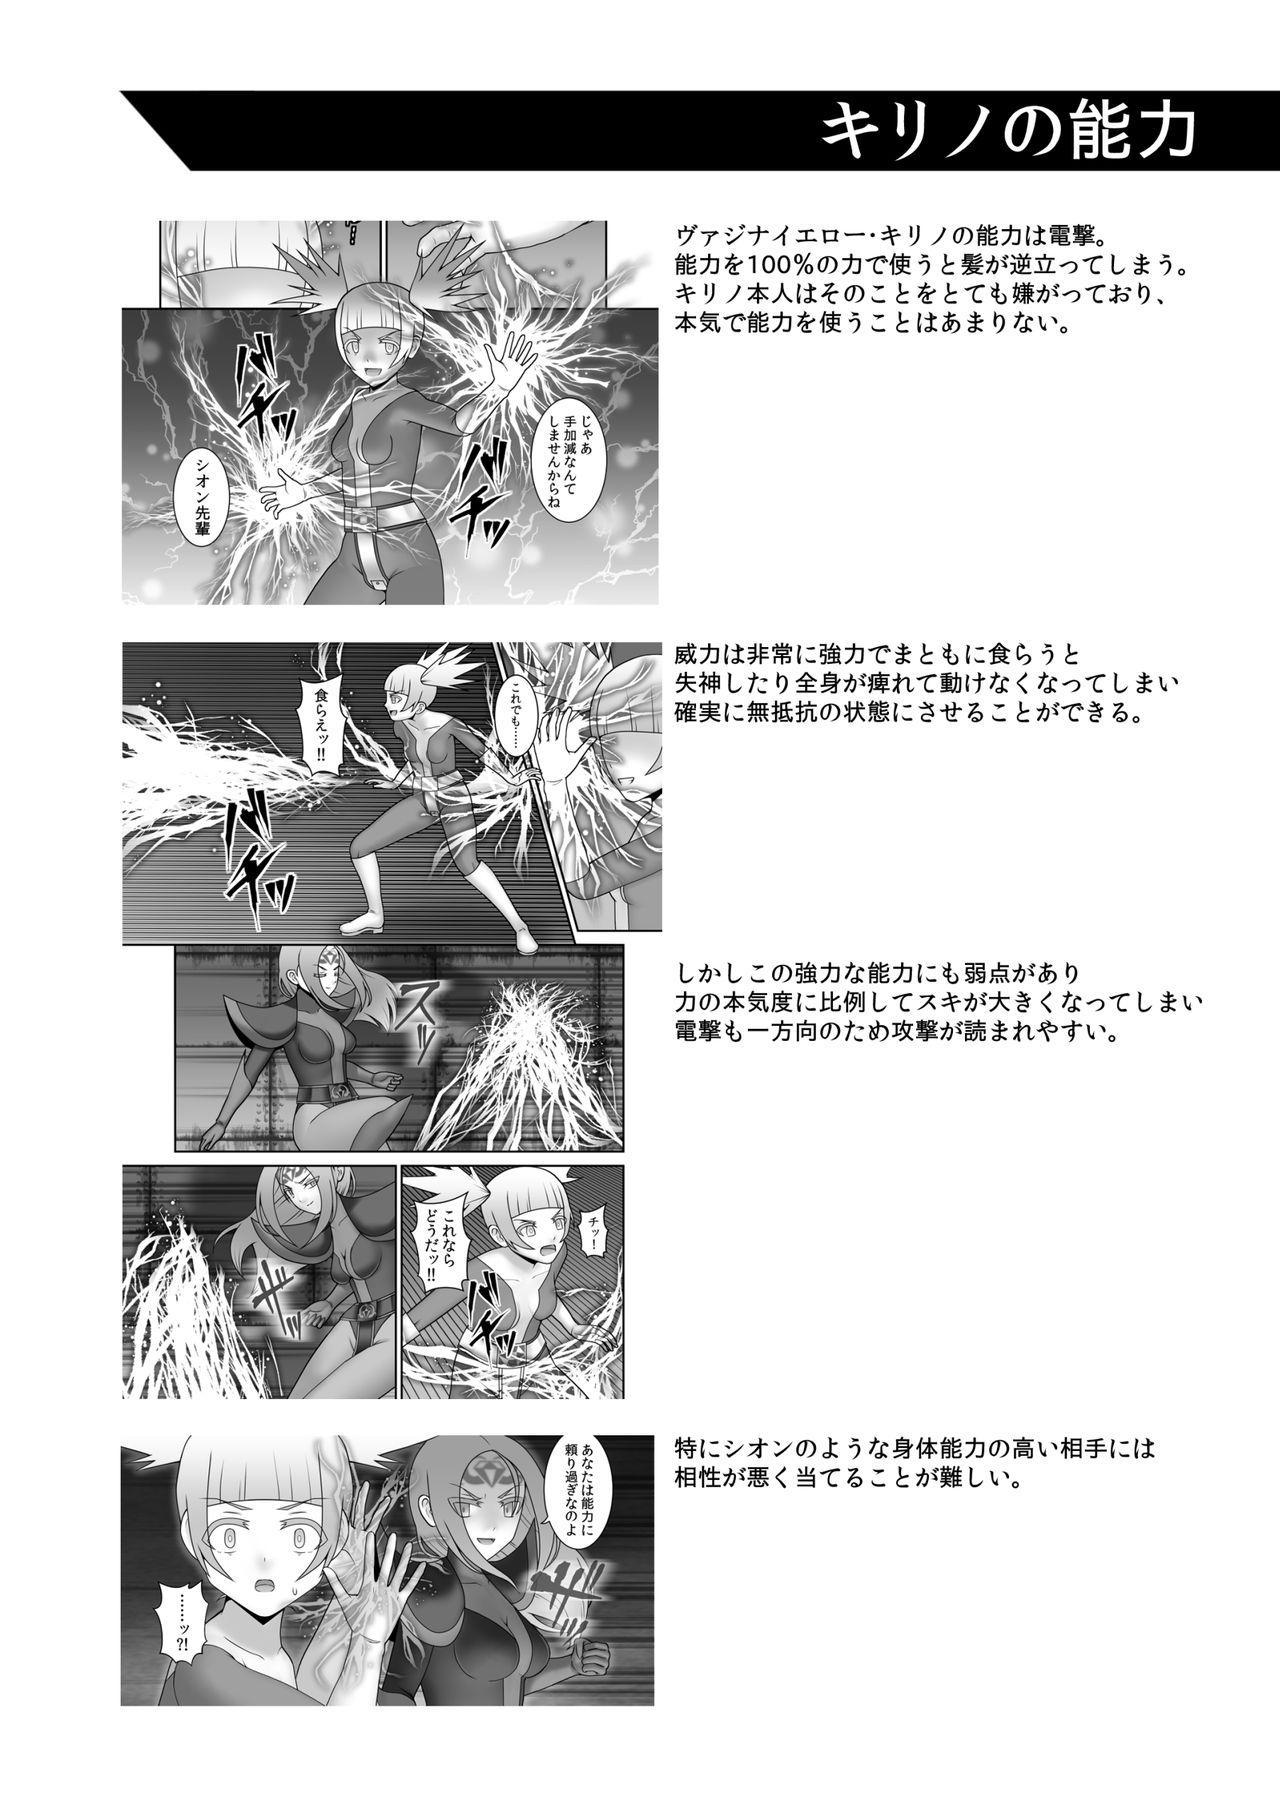 [STUDIO HP+ (IceLee)] Teisou Sentai Virginal Colors Dai-Go-wa 42